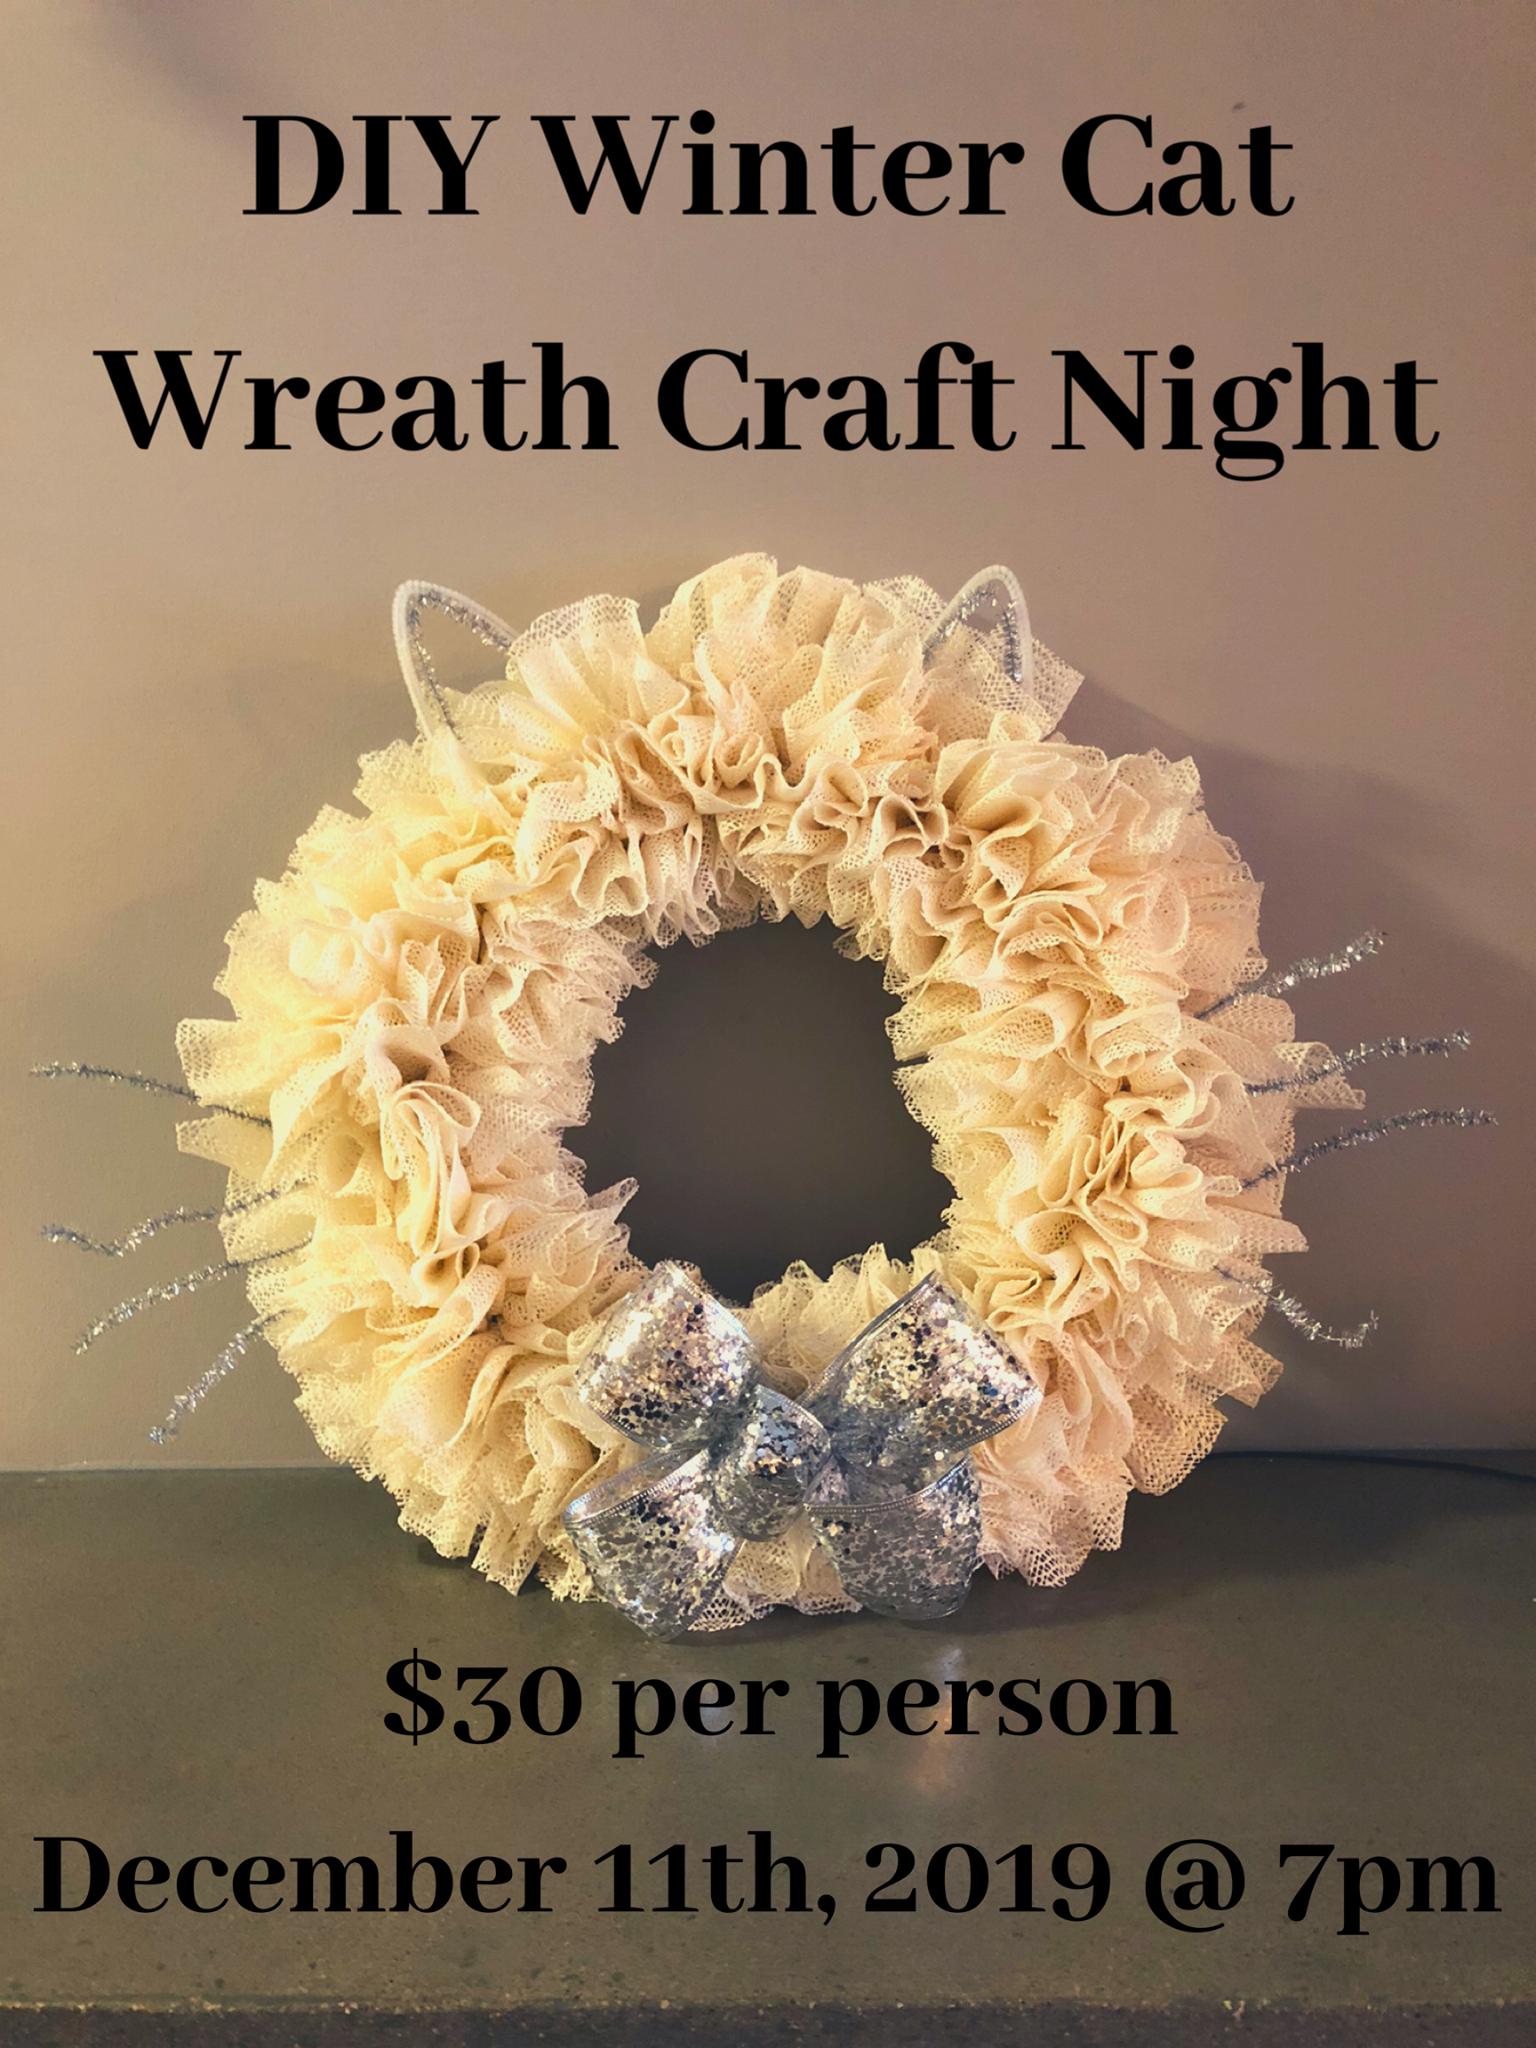 DIY Winter Cat Wreath Craft Night